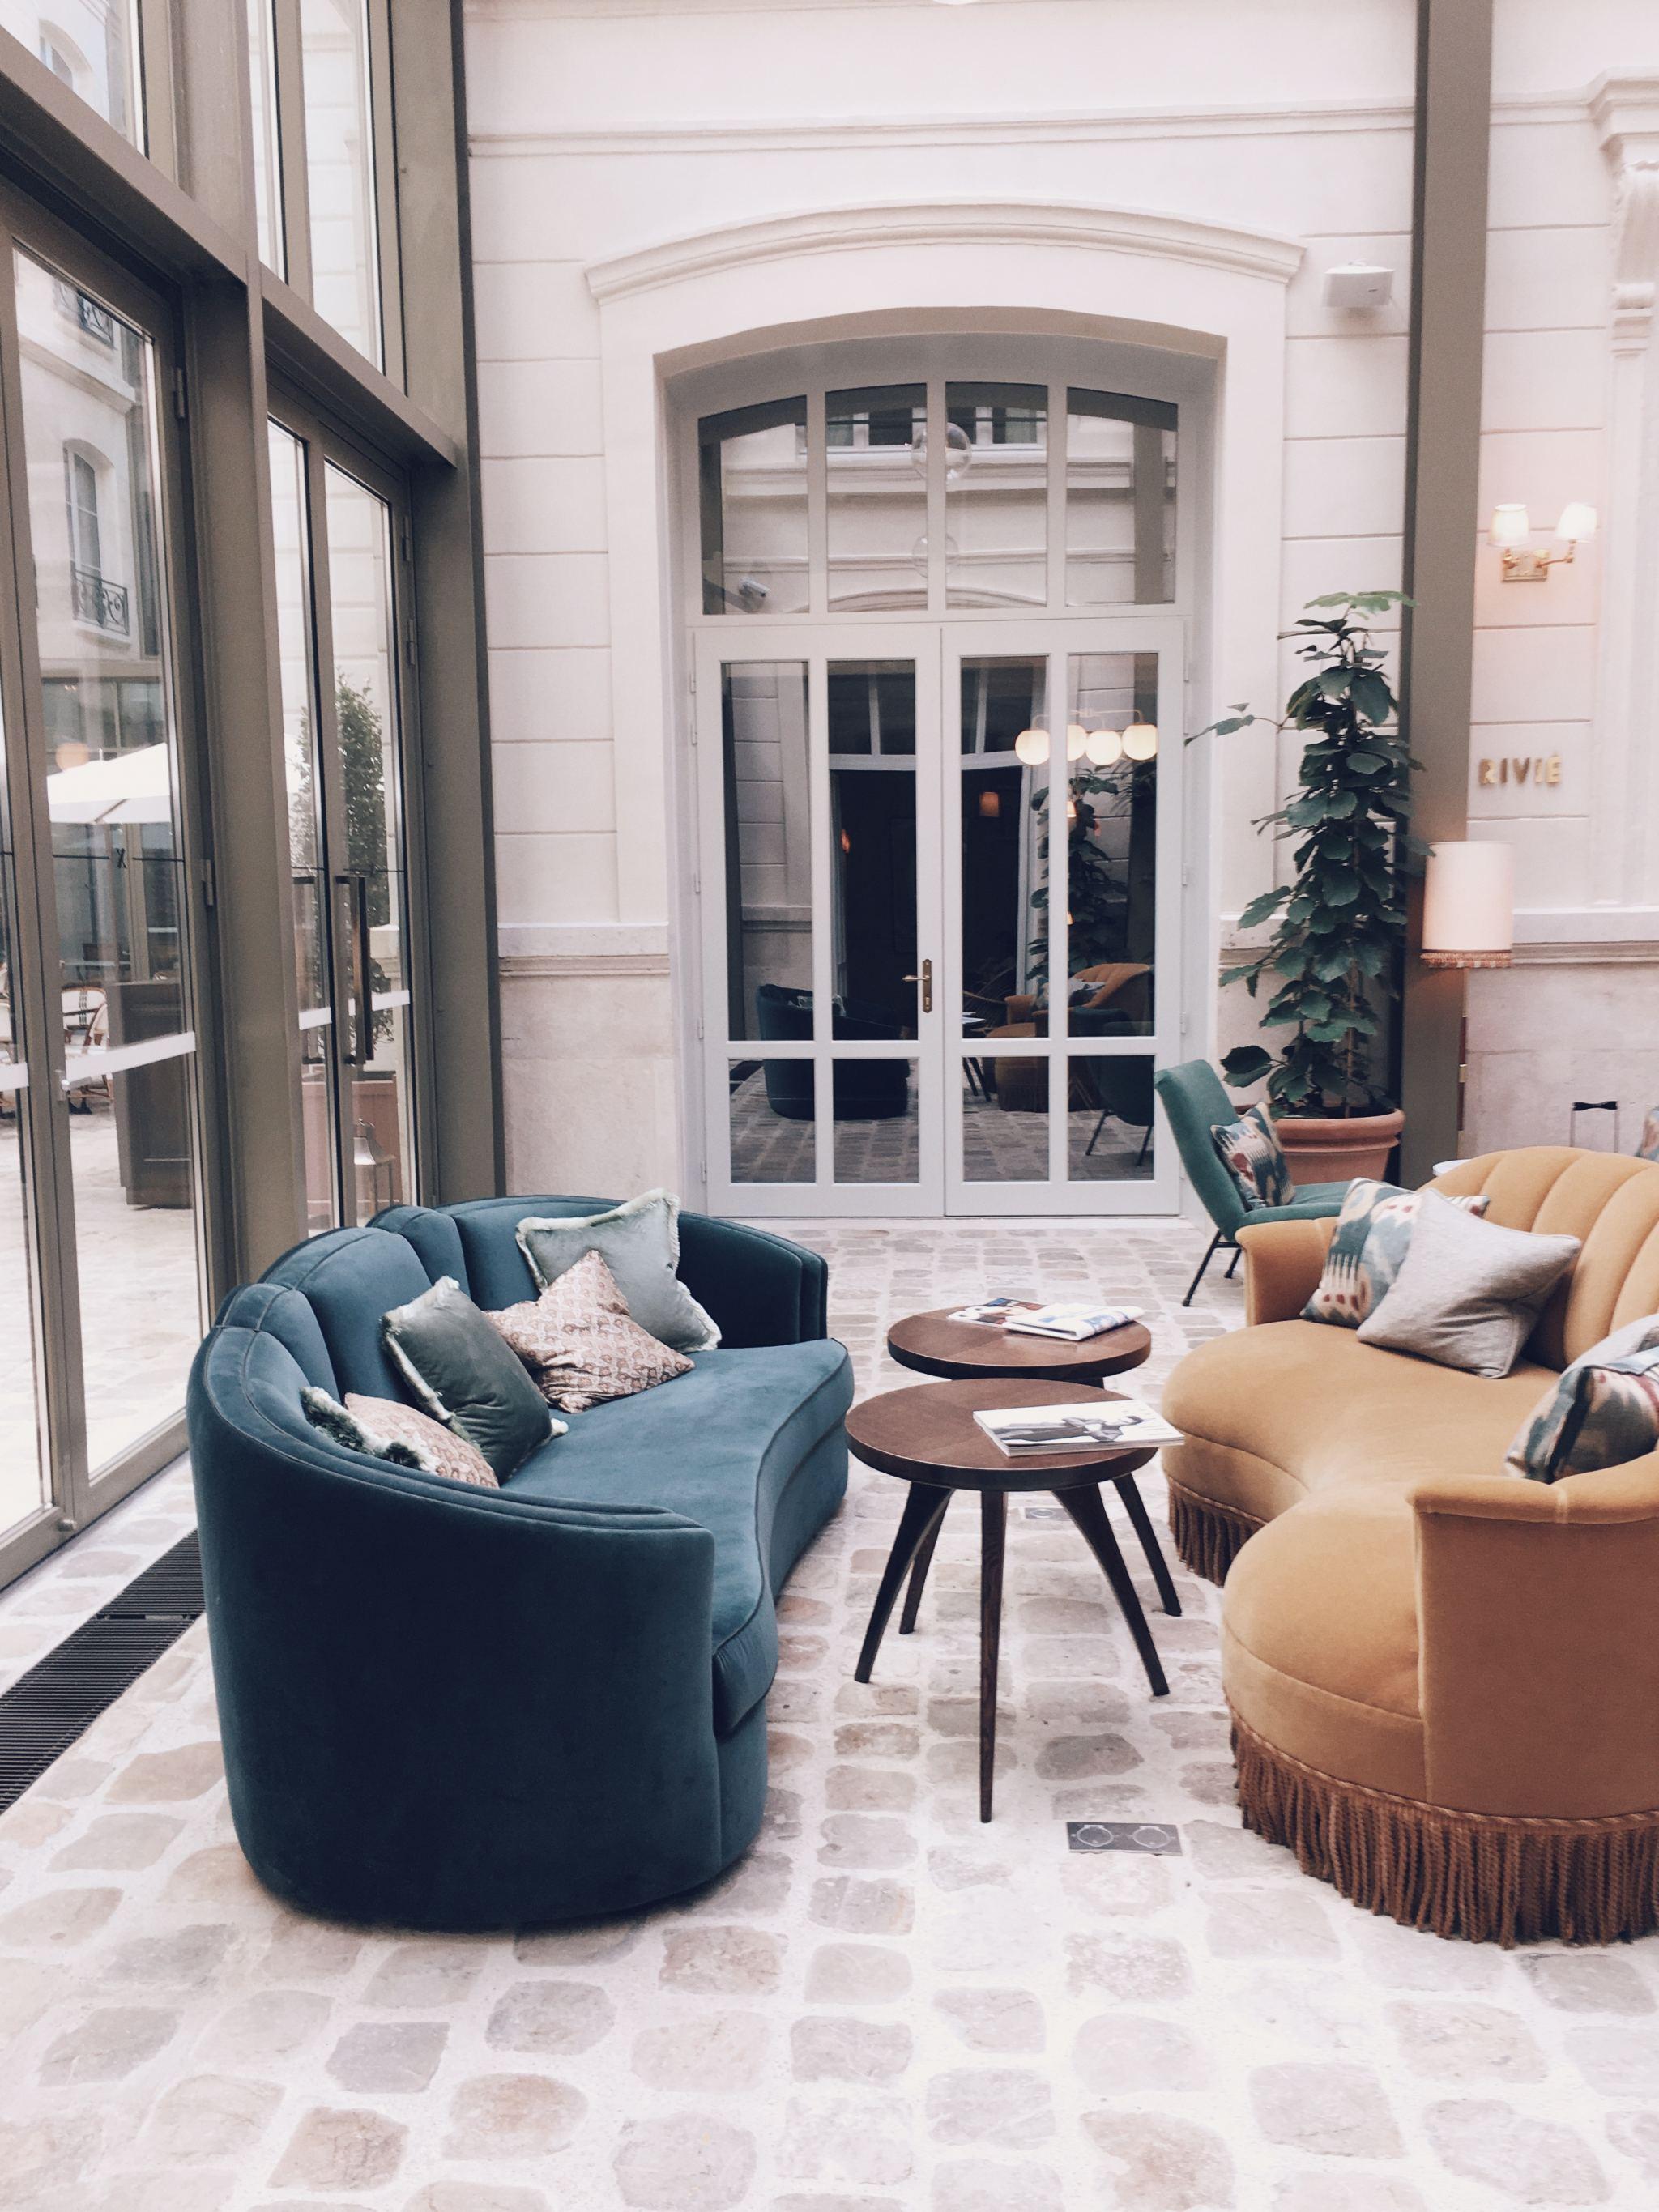 COCOA CHELSEA paris wallis interior goals hoxton hotel